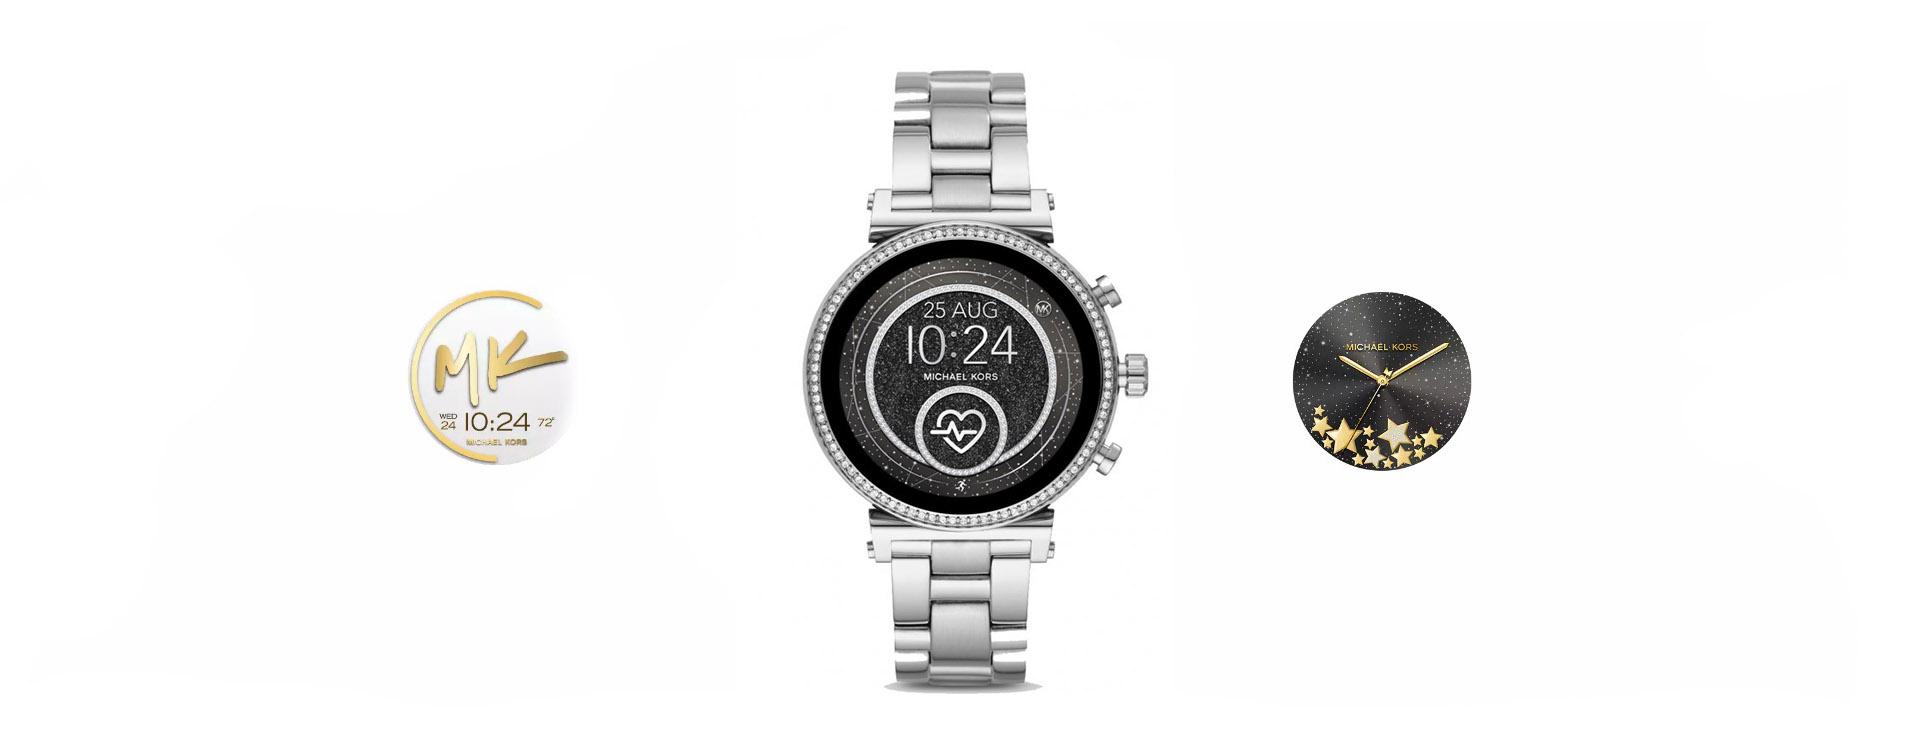 Michale Kors Smart Watch